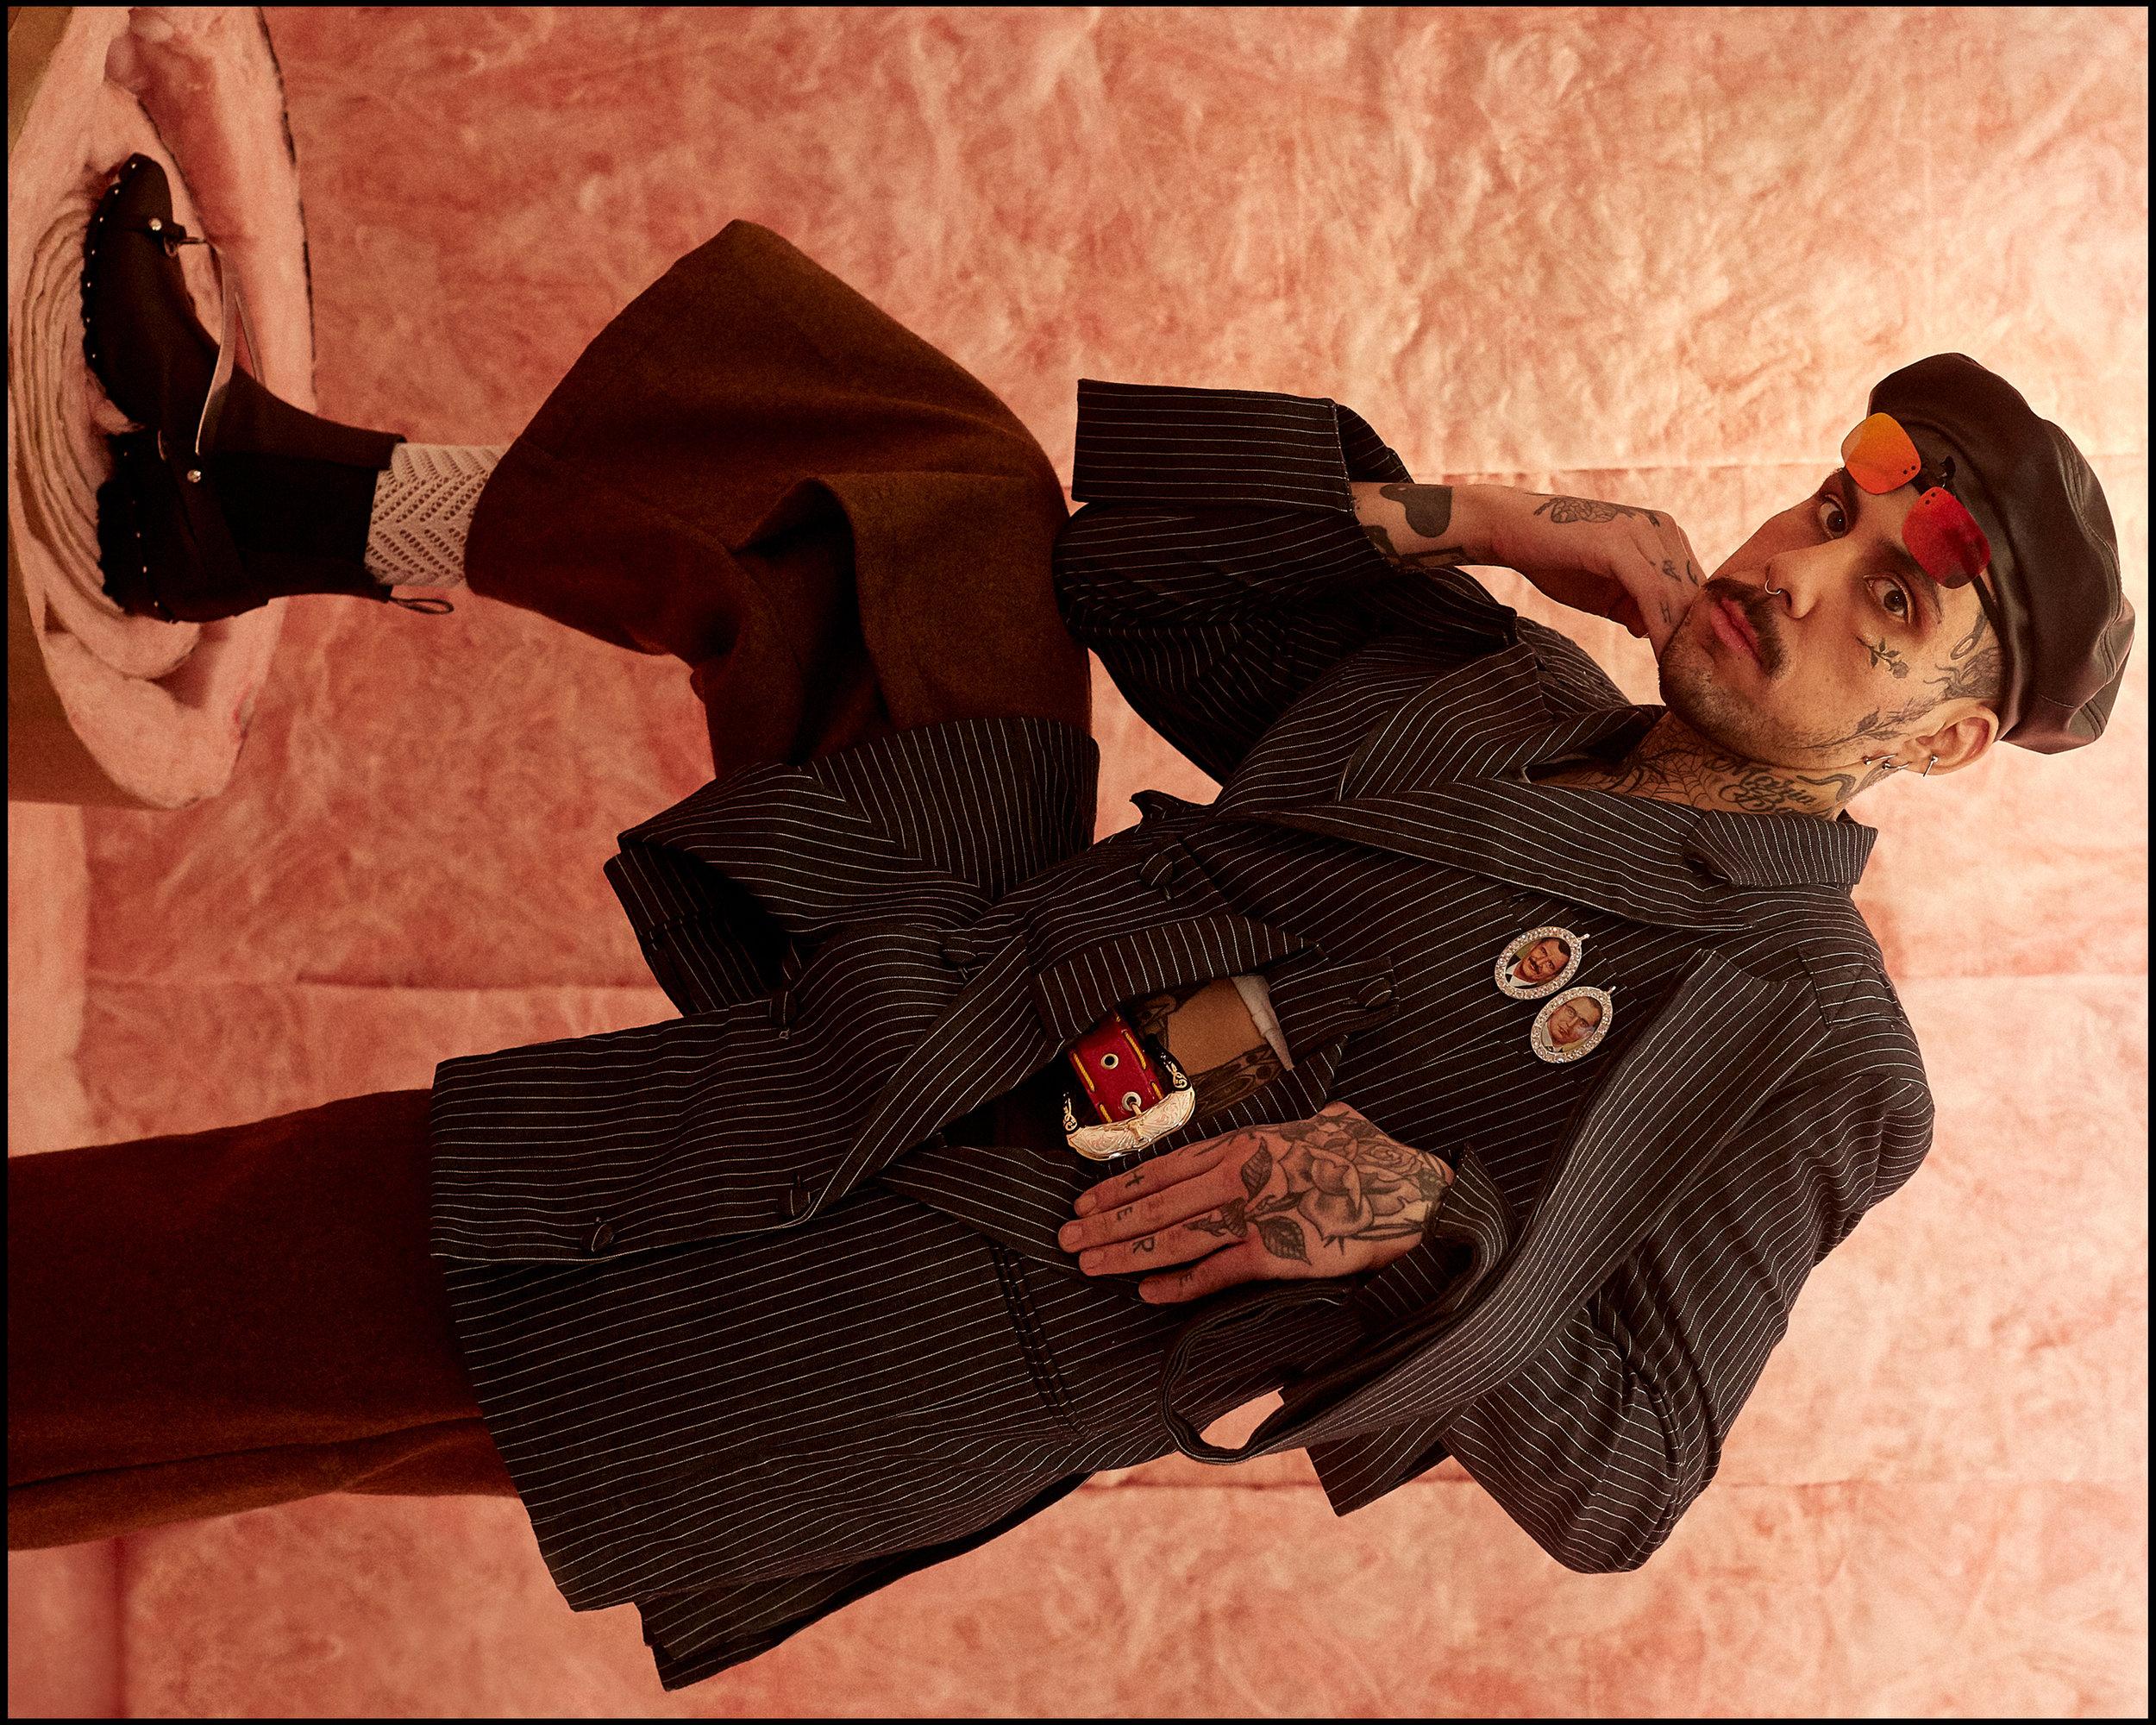 Black_Frame_SanchezKane_RicardoRivera_01.jpg